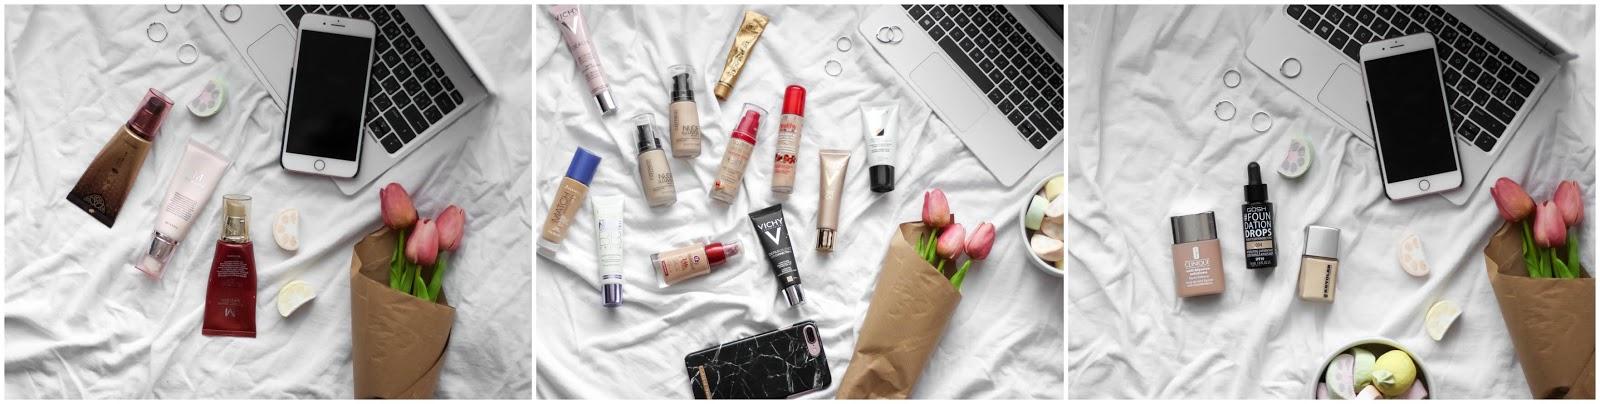 spotřebovaná kosmetika, dekorativní kosmetika makeupy korektory